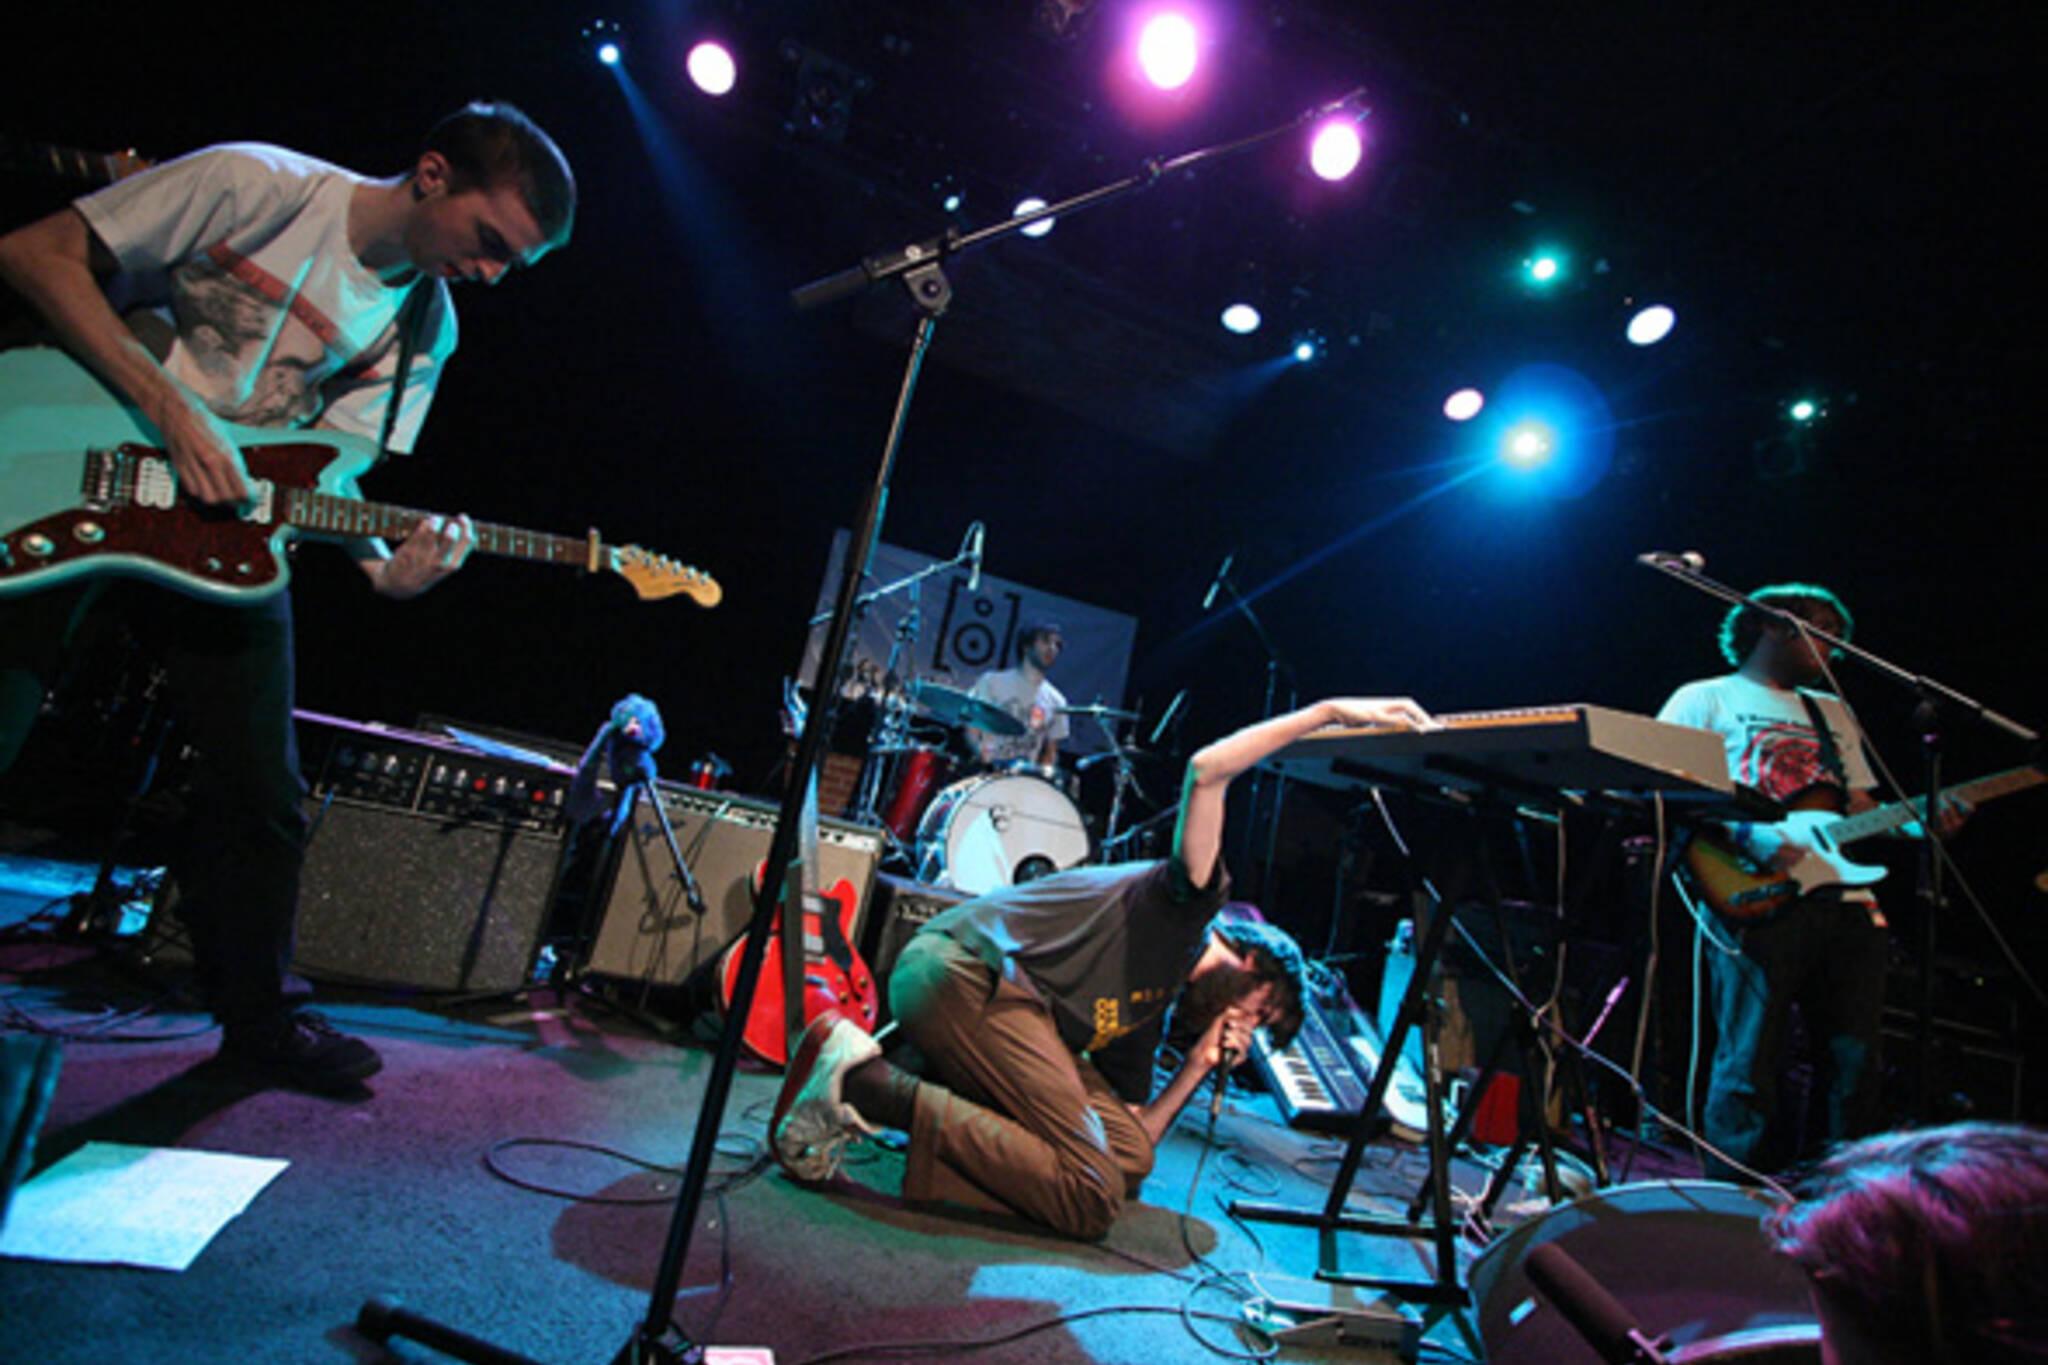 Live music Toronto